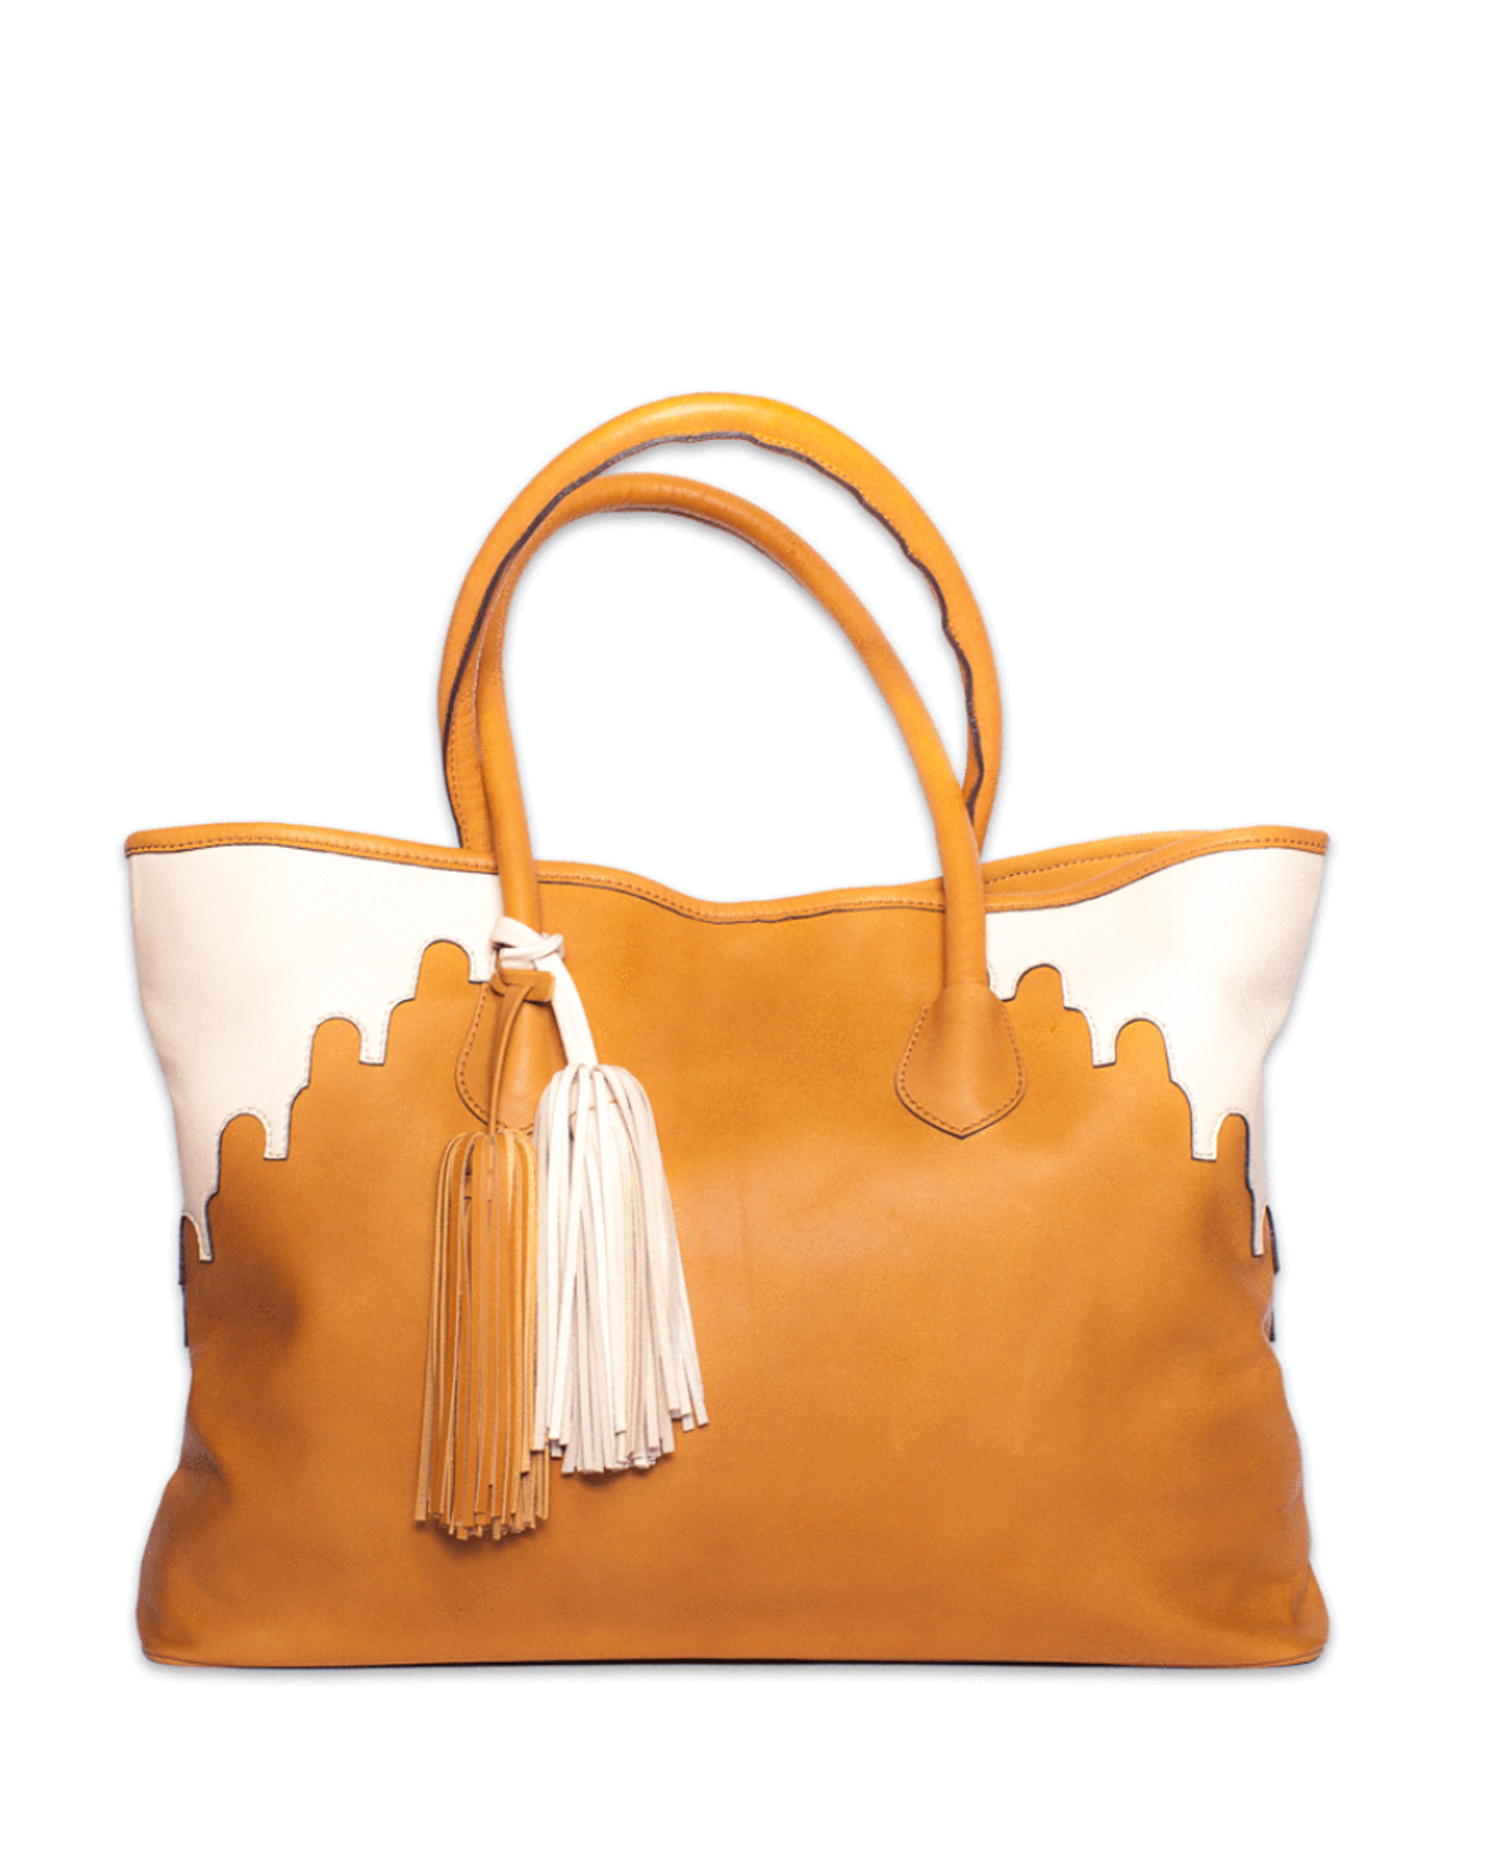 abury-rabbia-camel-leather-shopper-totebag.jpg